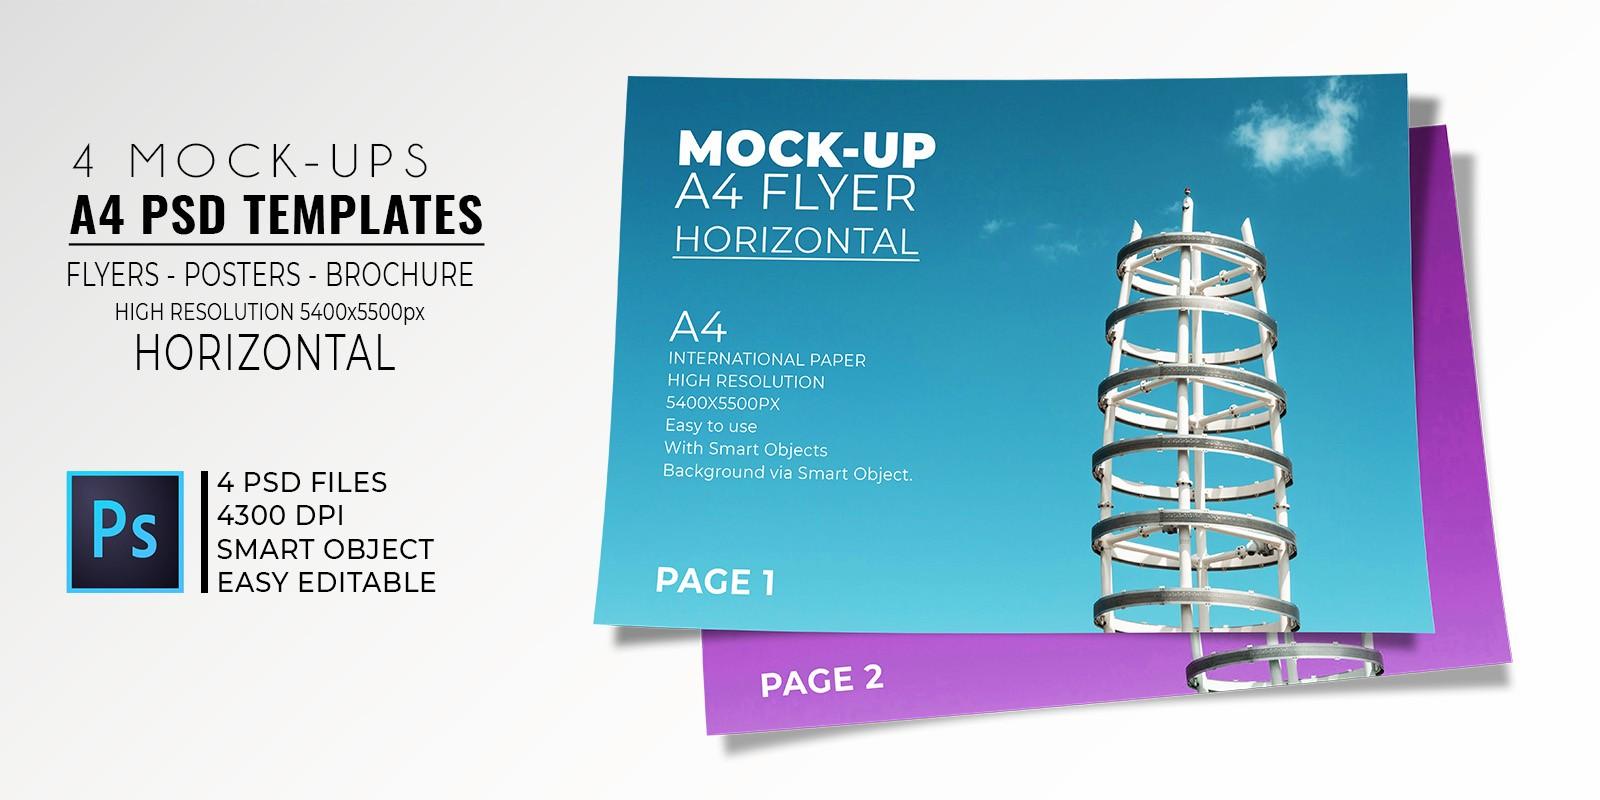 4 Horizontal Mock-Up Flyer PSD Templates A4